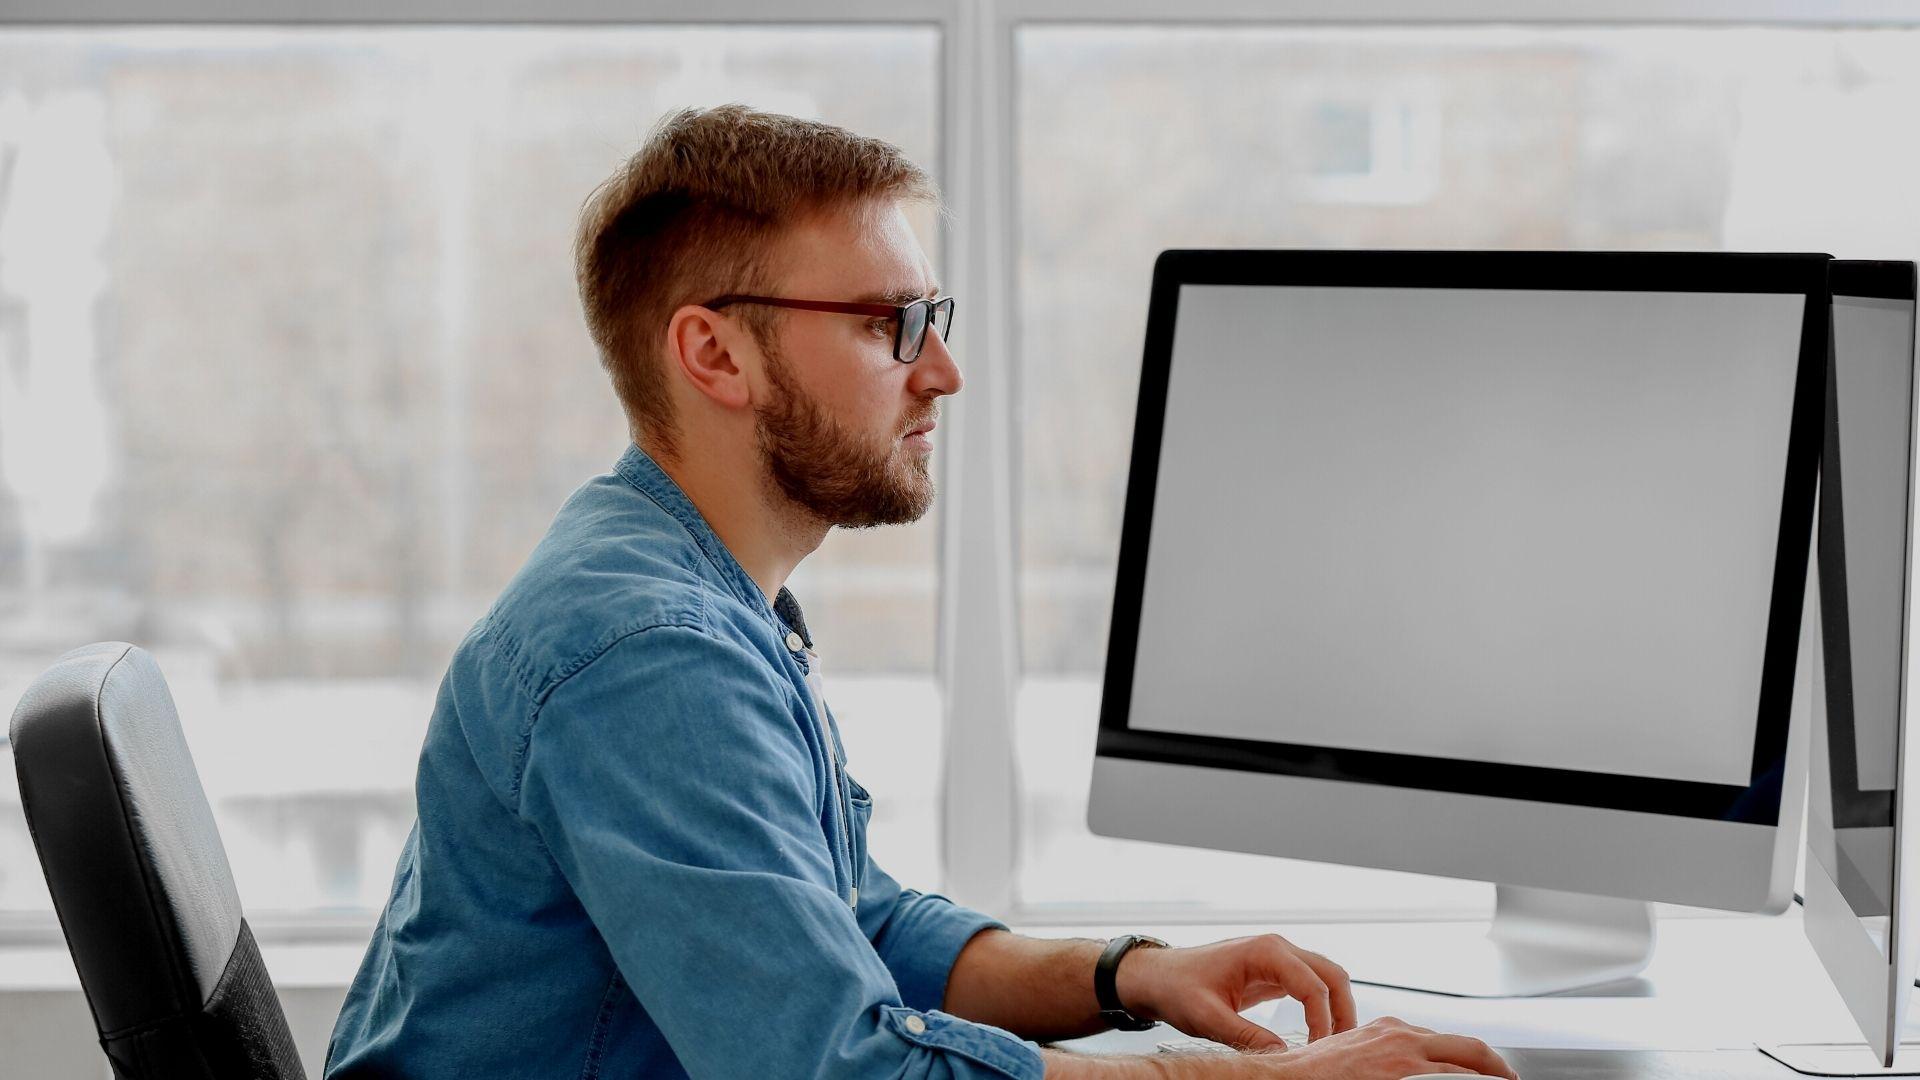 Certified IT Project Manager – Πιστοποιημένος Διαχειριστής Έργων Τεχνολογίας